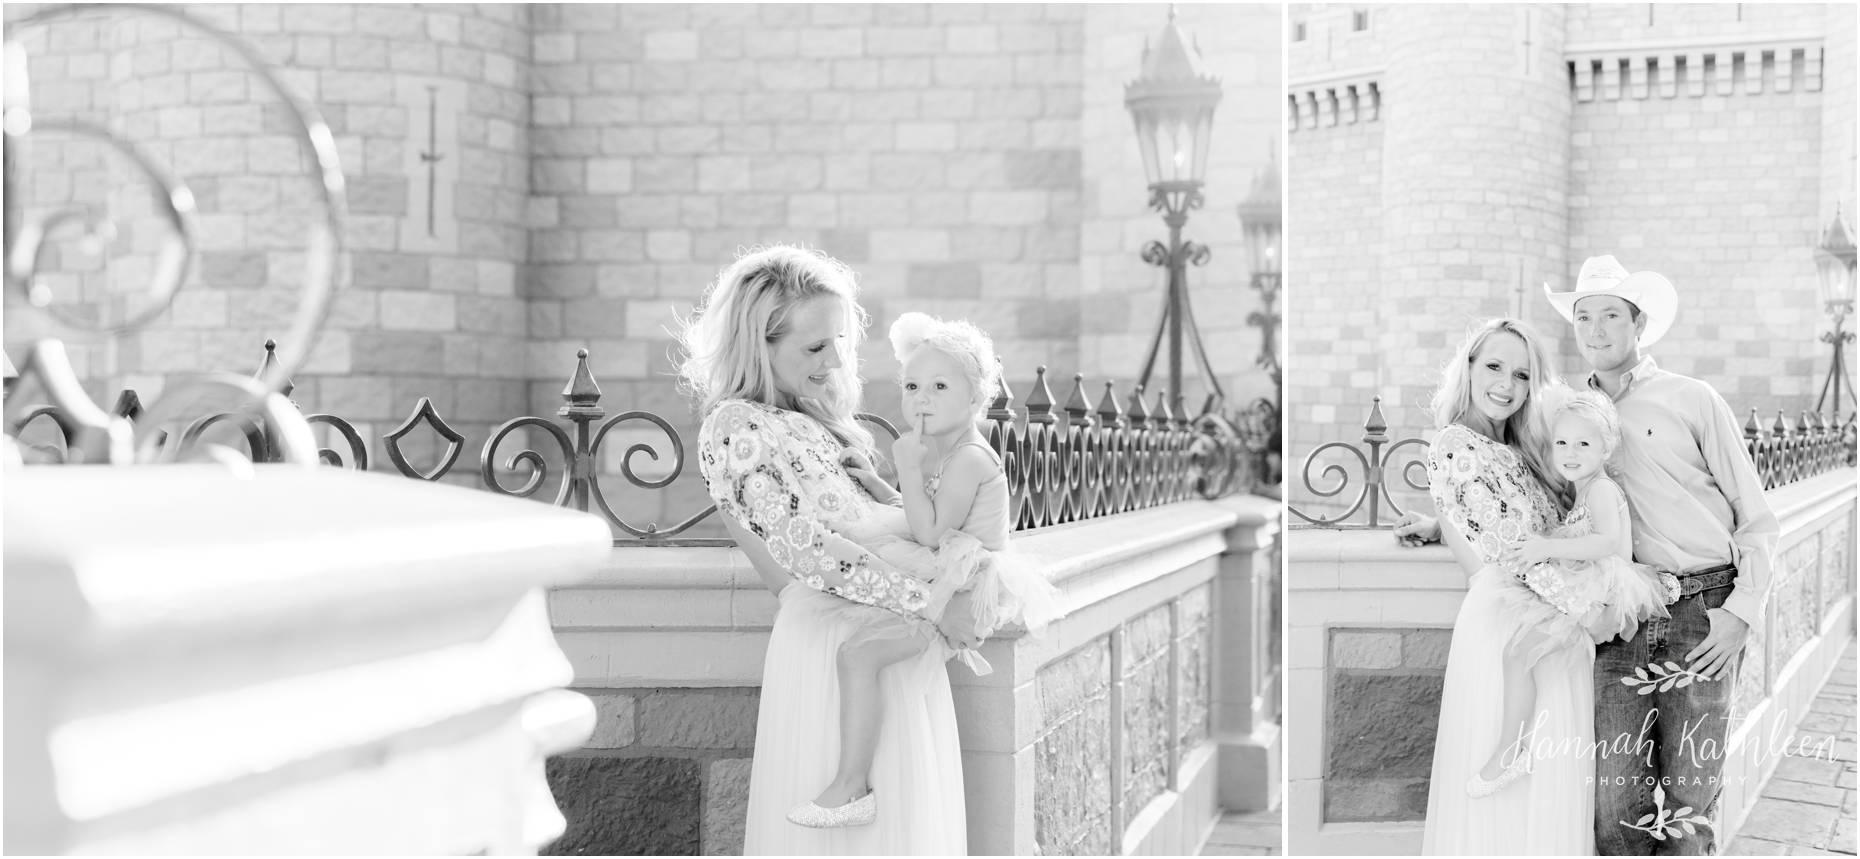 Moneyhon_Magic_Kingdom_Disney_World_Family_Photography